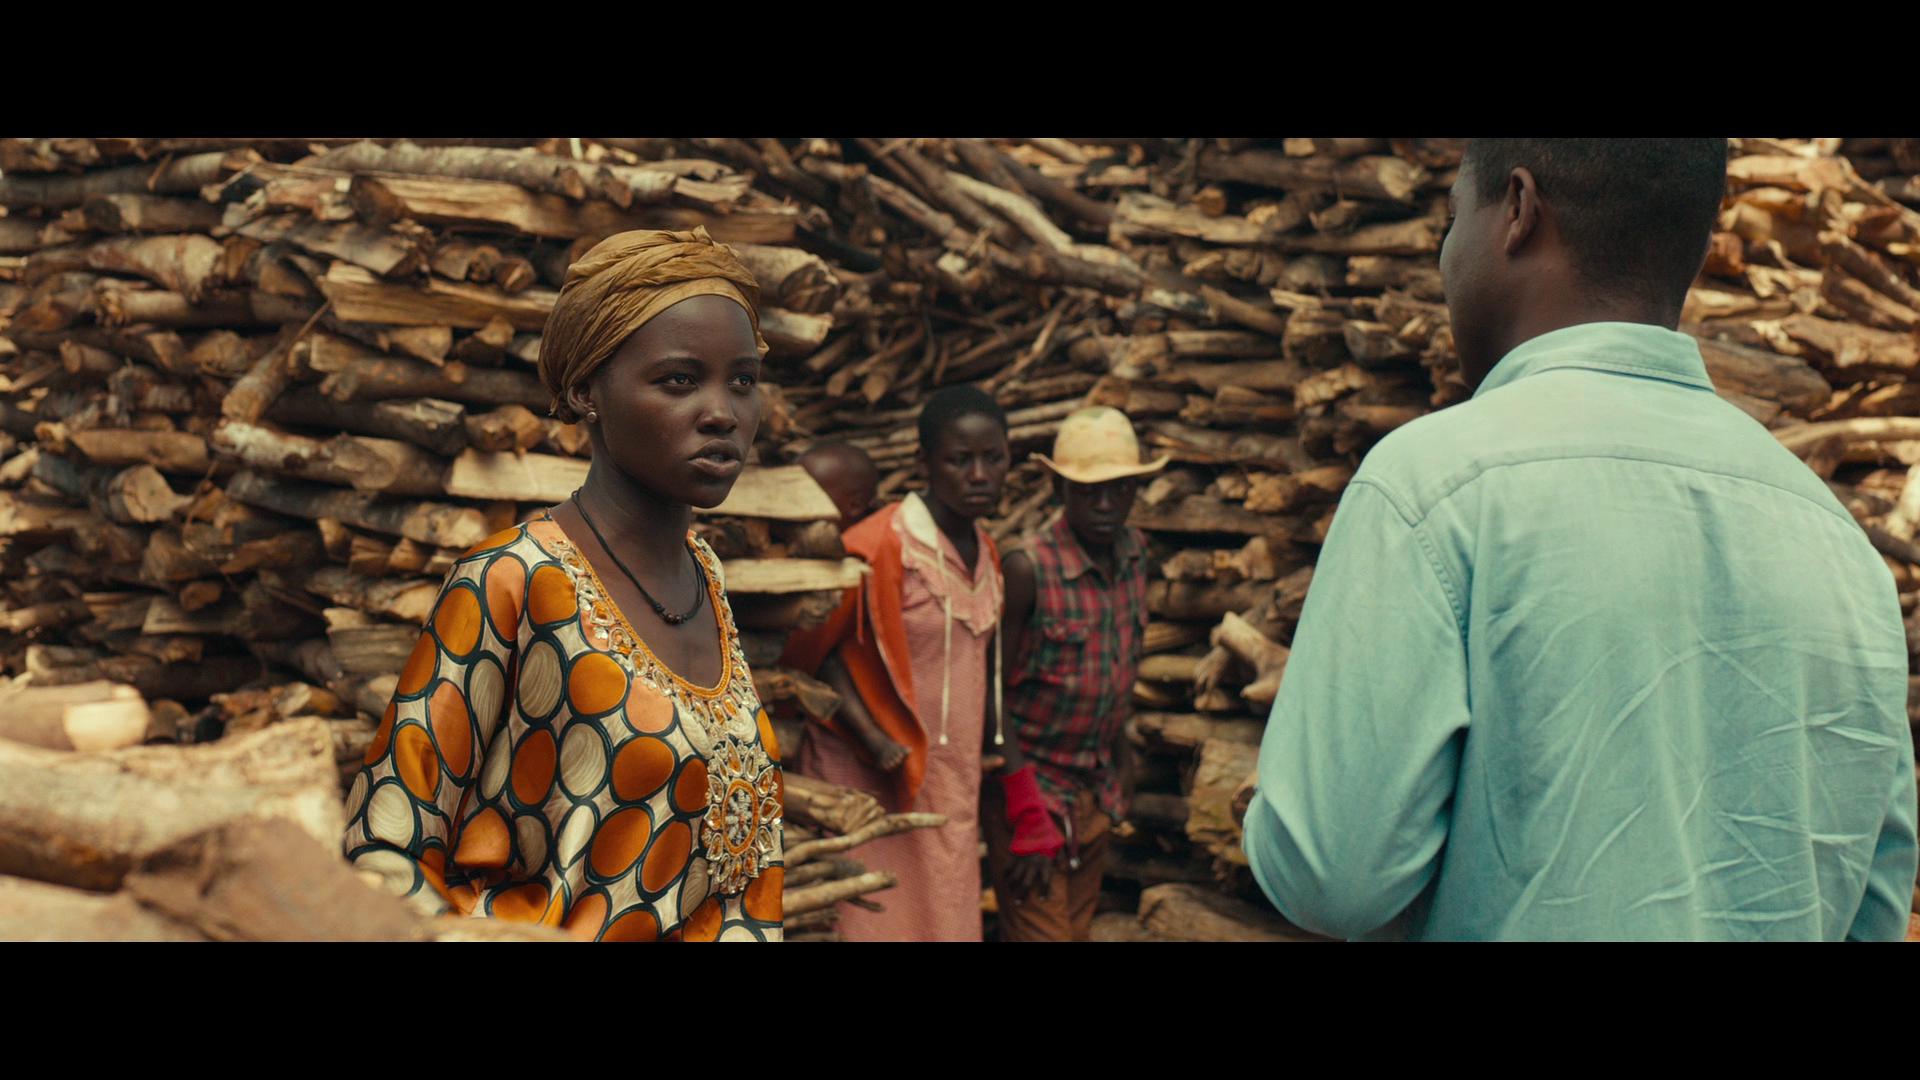 La reina de Katwe (2016) 1080p Remux Latino